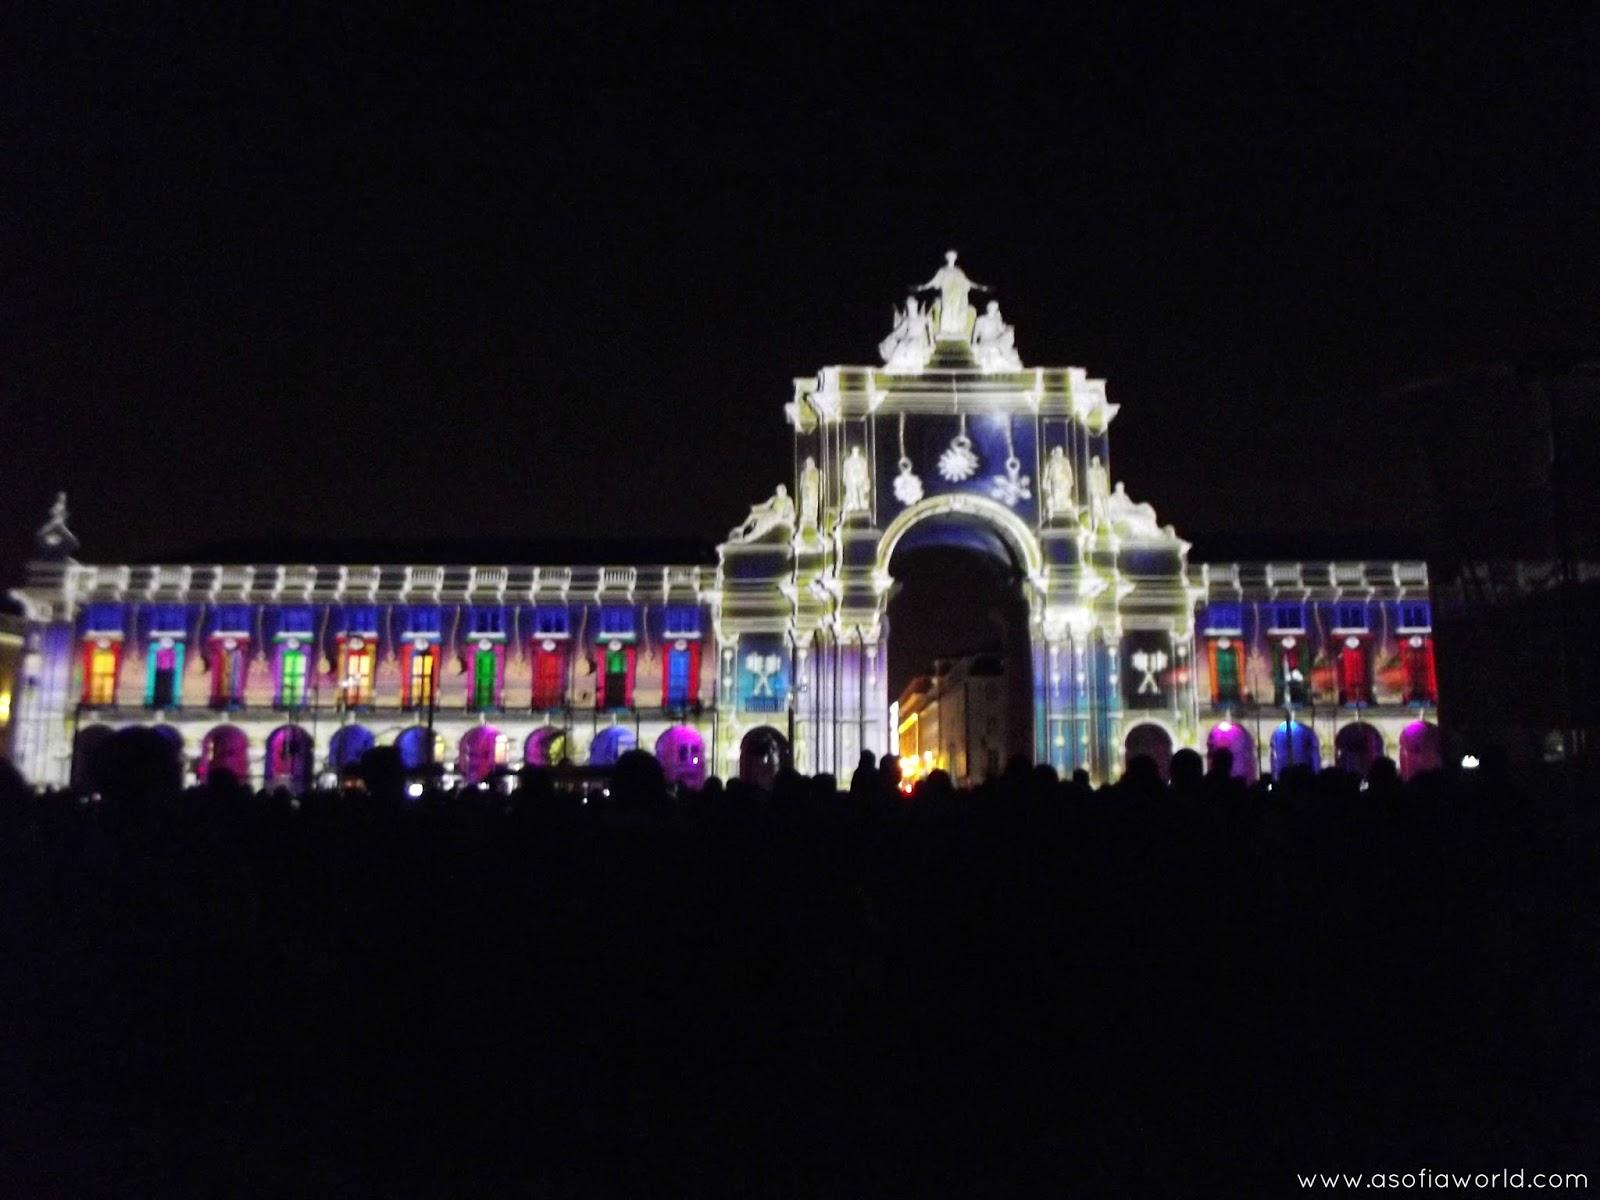 Lisboa: Christmas edition